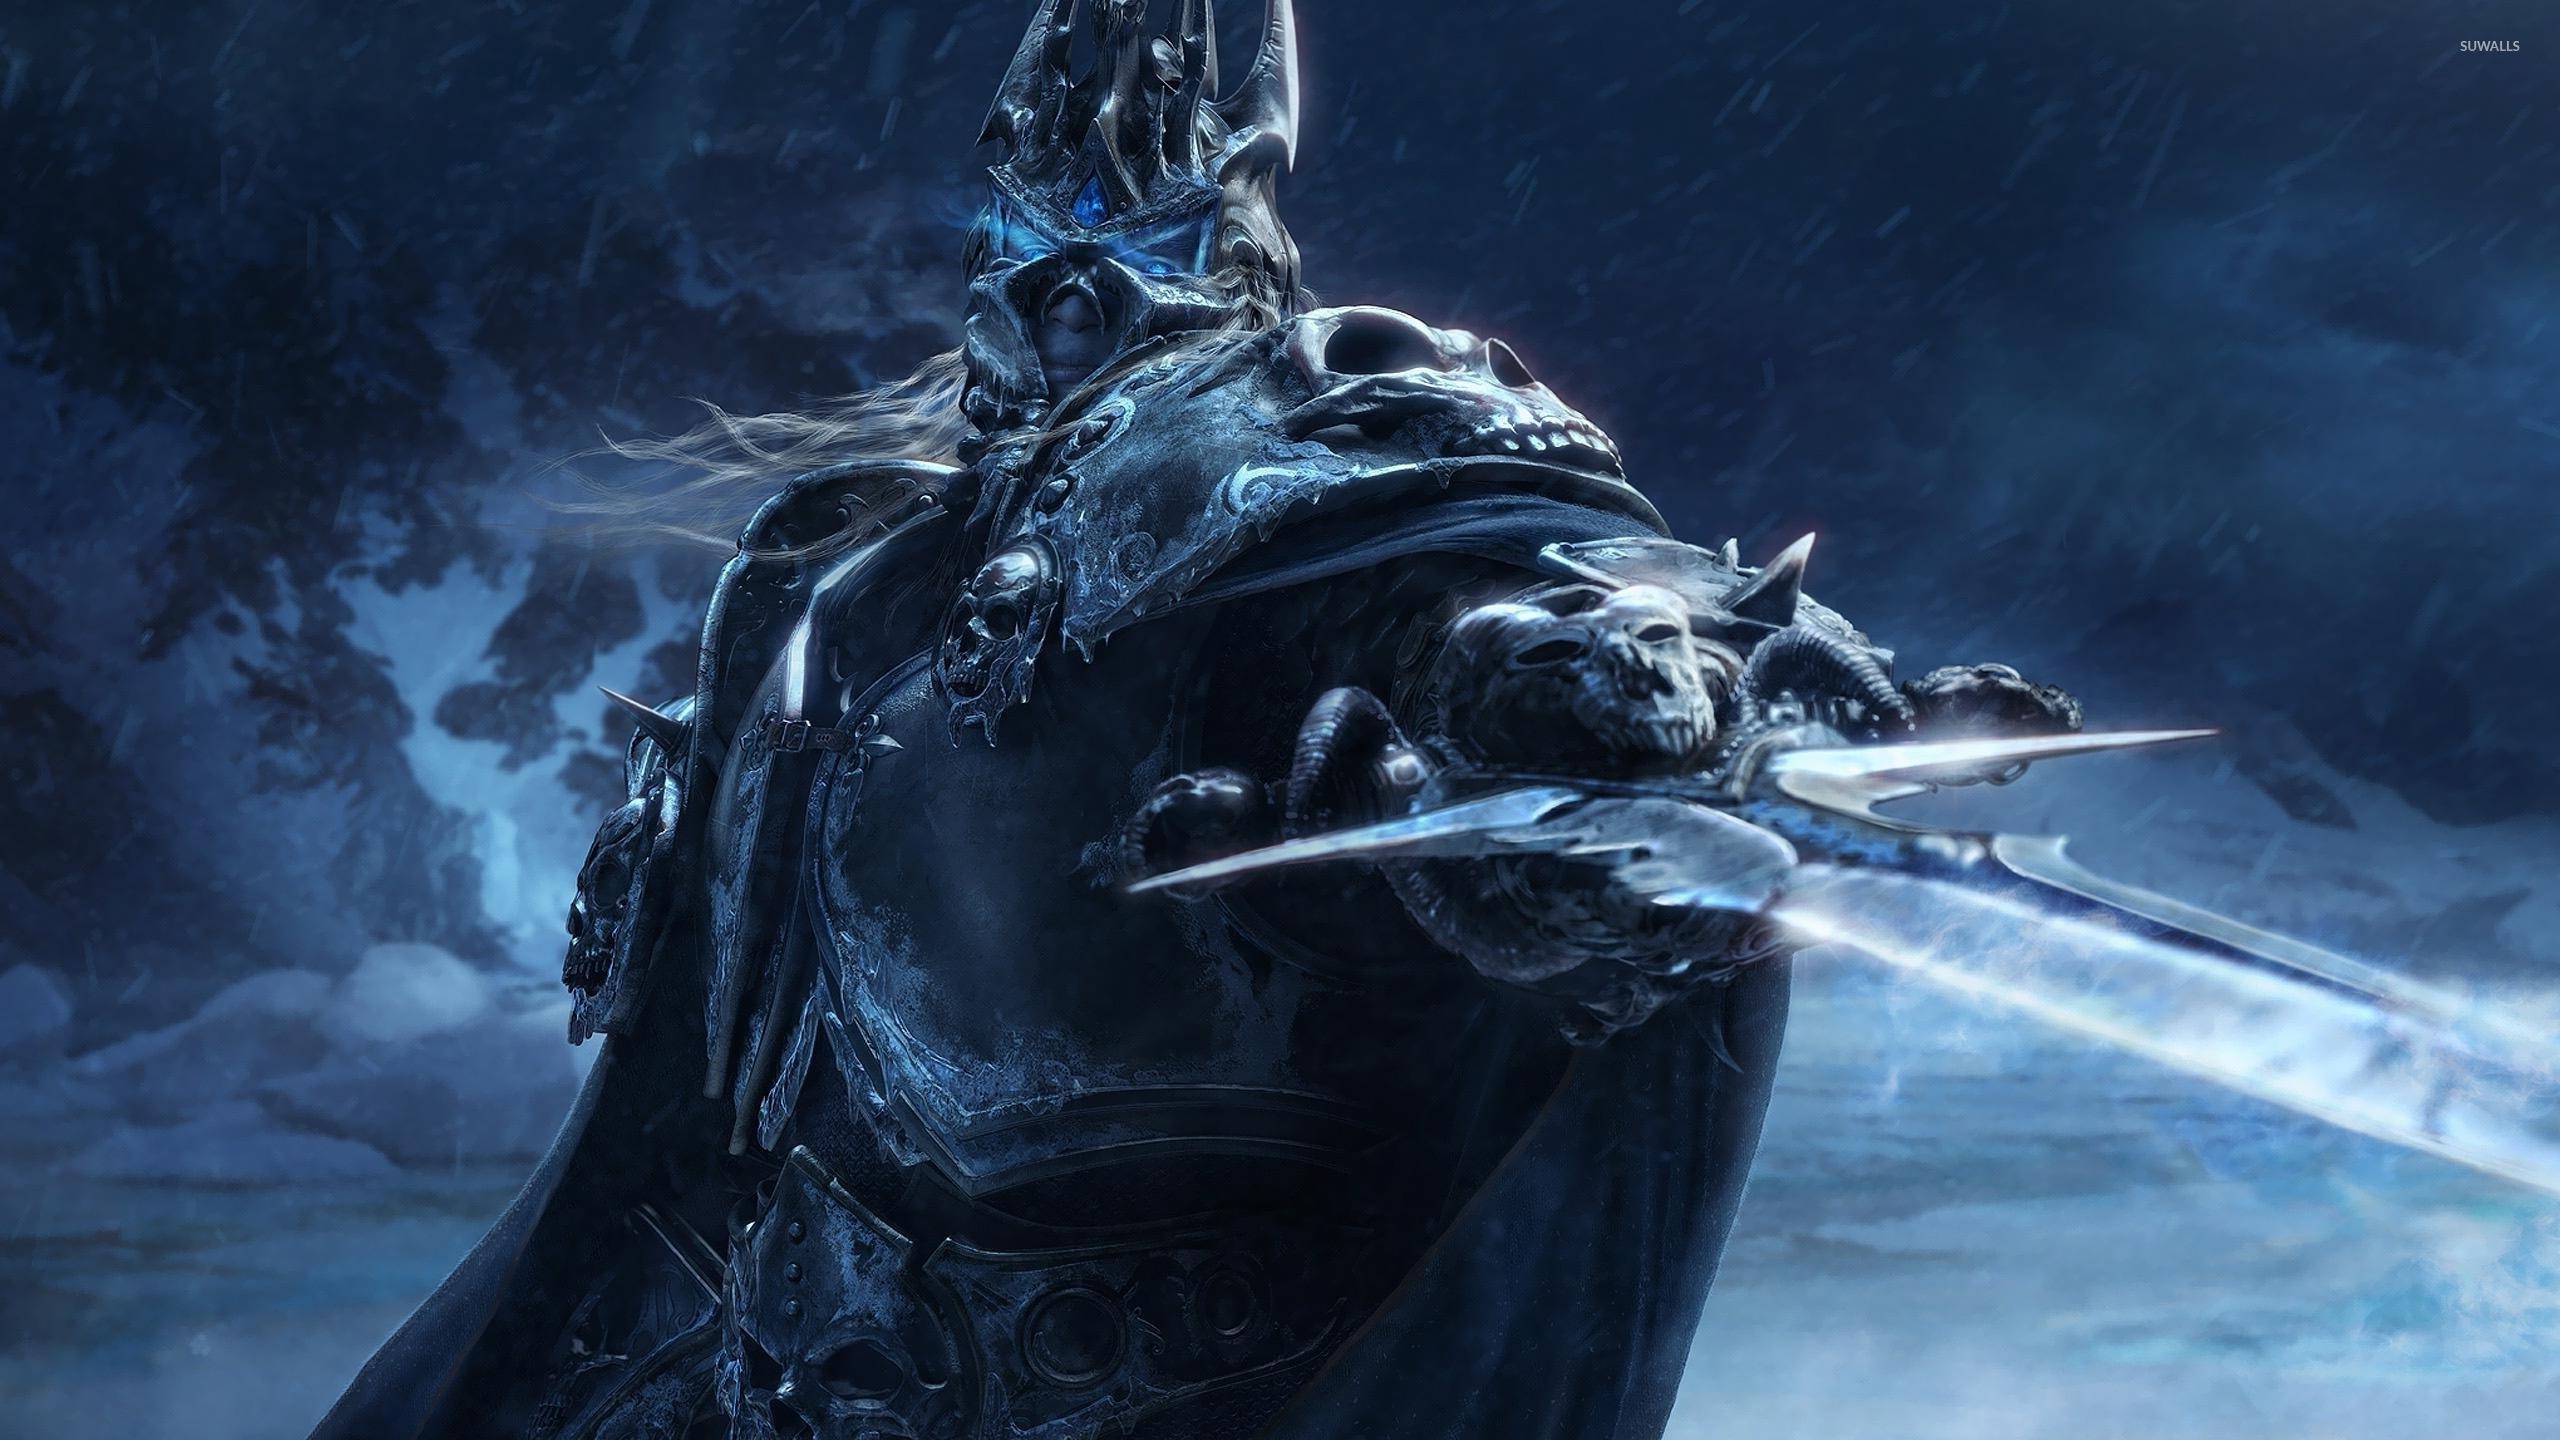 World Of Warcraft Desktop Wallpaper Posted By Sarah Peltier